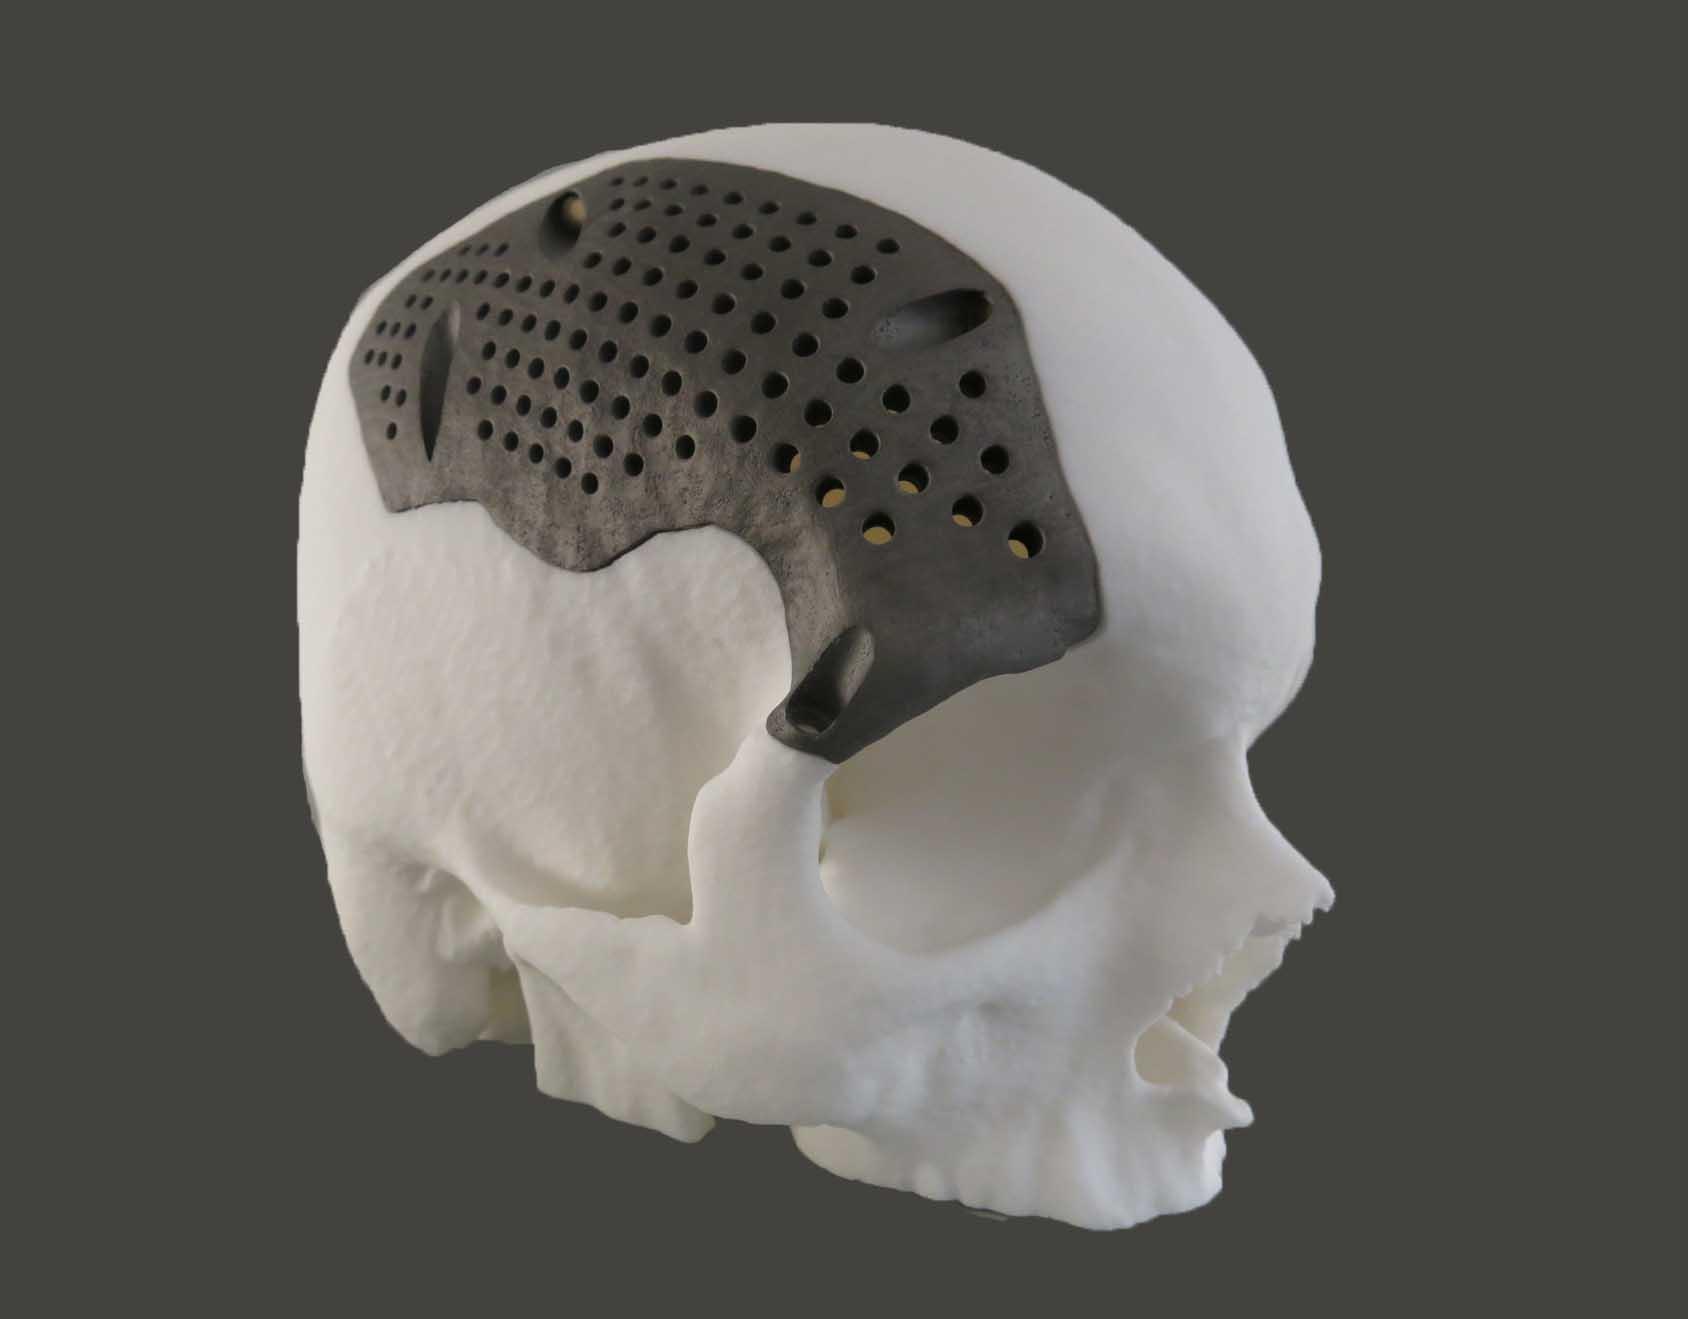 3D Printed titanium-medical-implants-sculpteo